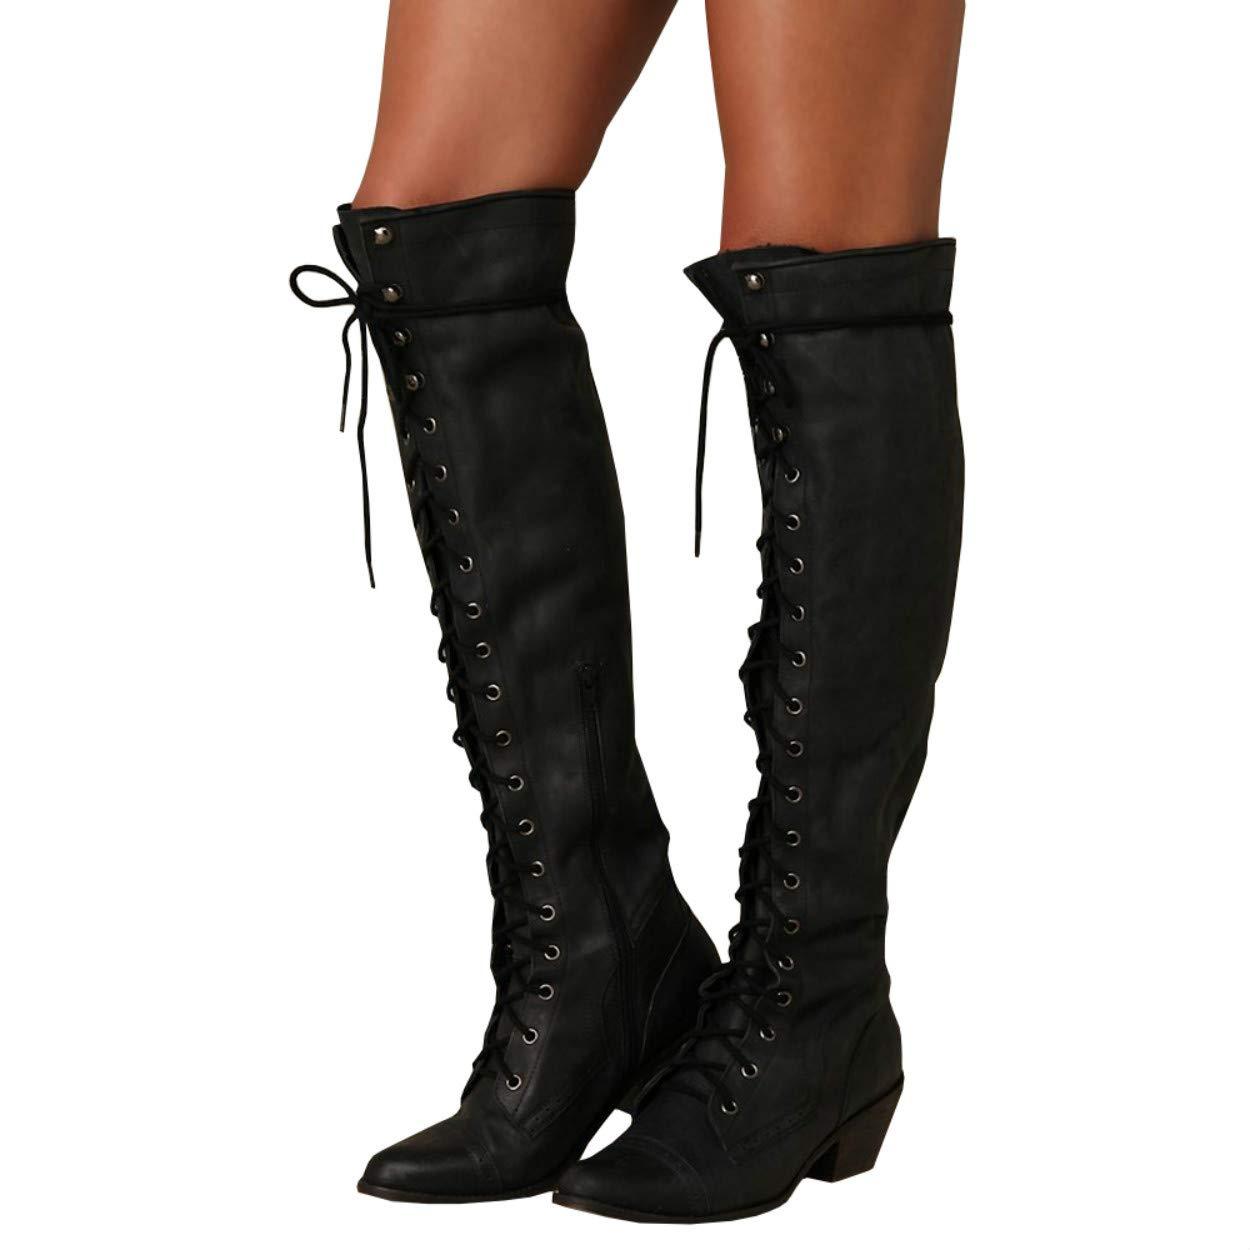 e1e6098a9 Amazon.com: Meilidress Womens Winter Cowgirl Boots Knee High Tall ...